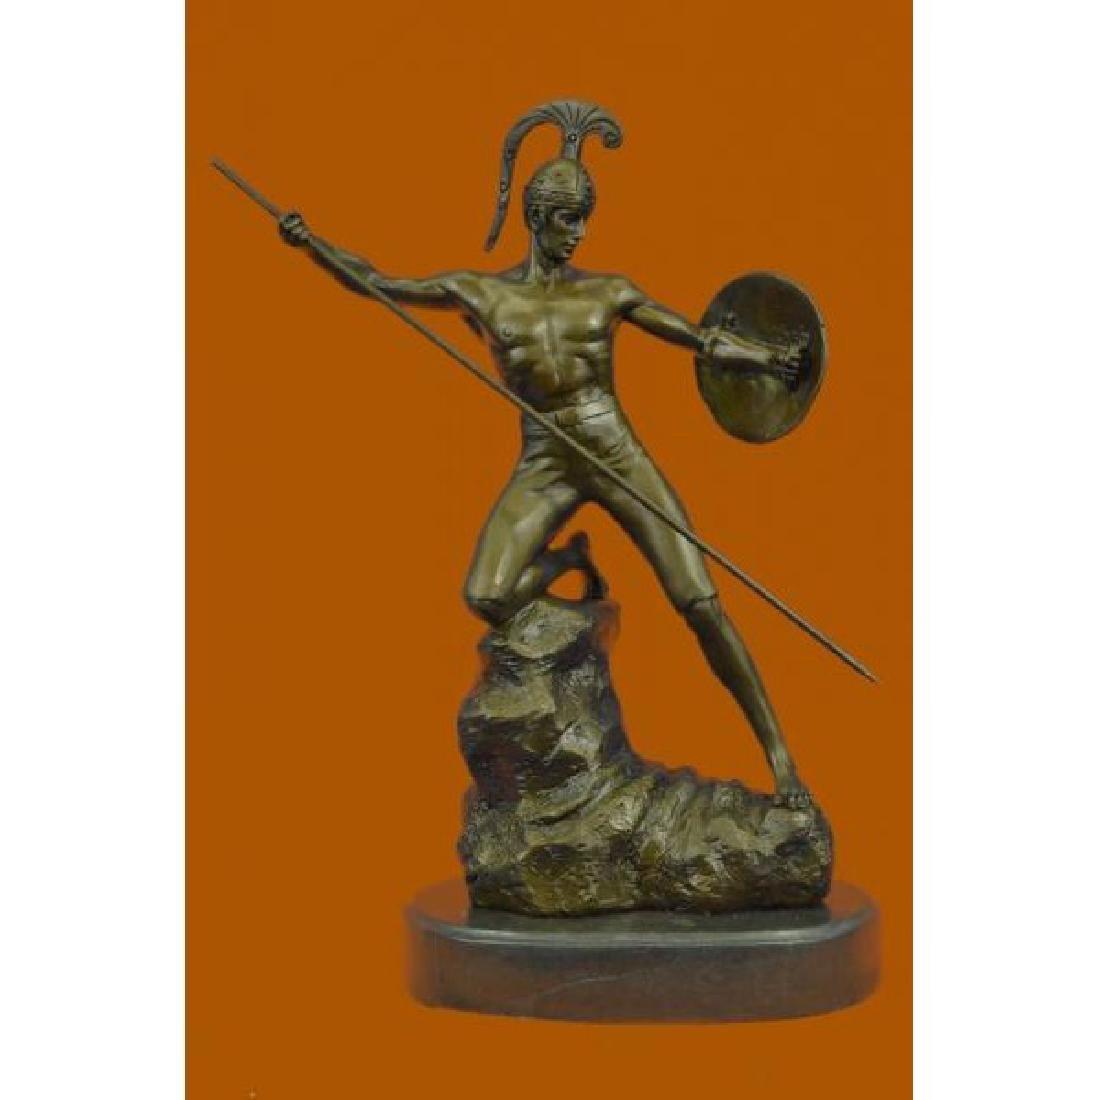 Vintage Neoclassical Greco/Roman Bronze Gladiator Nude